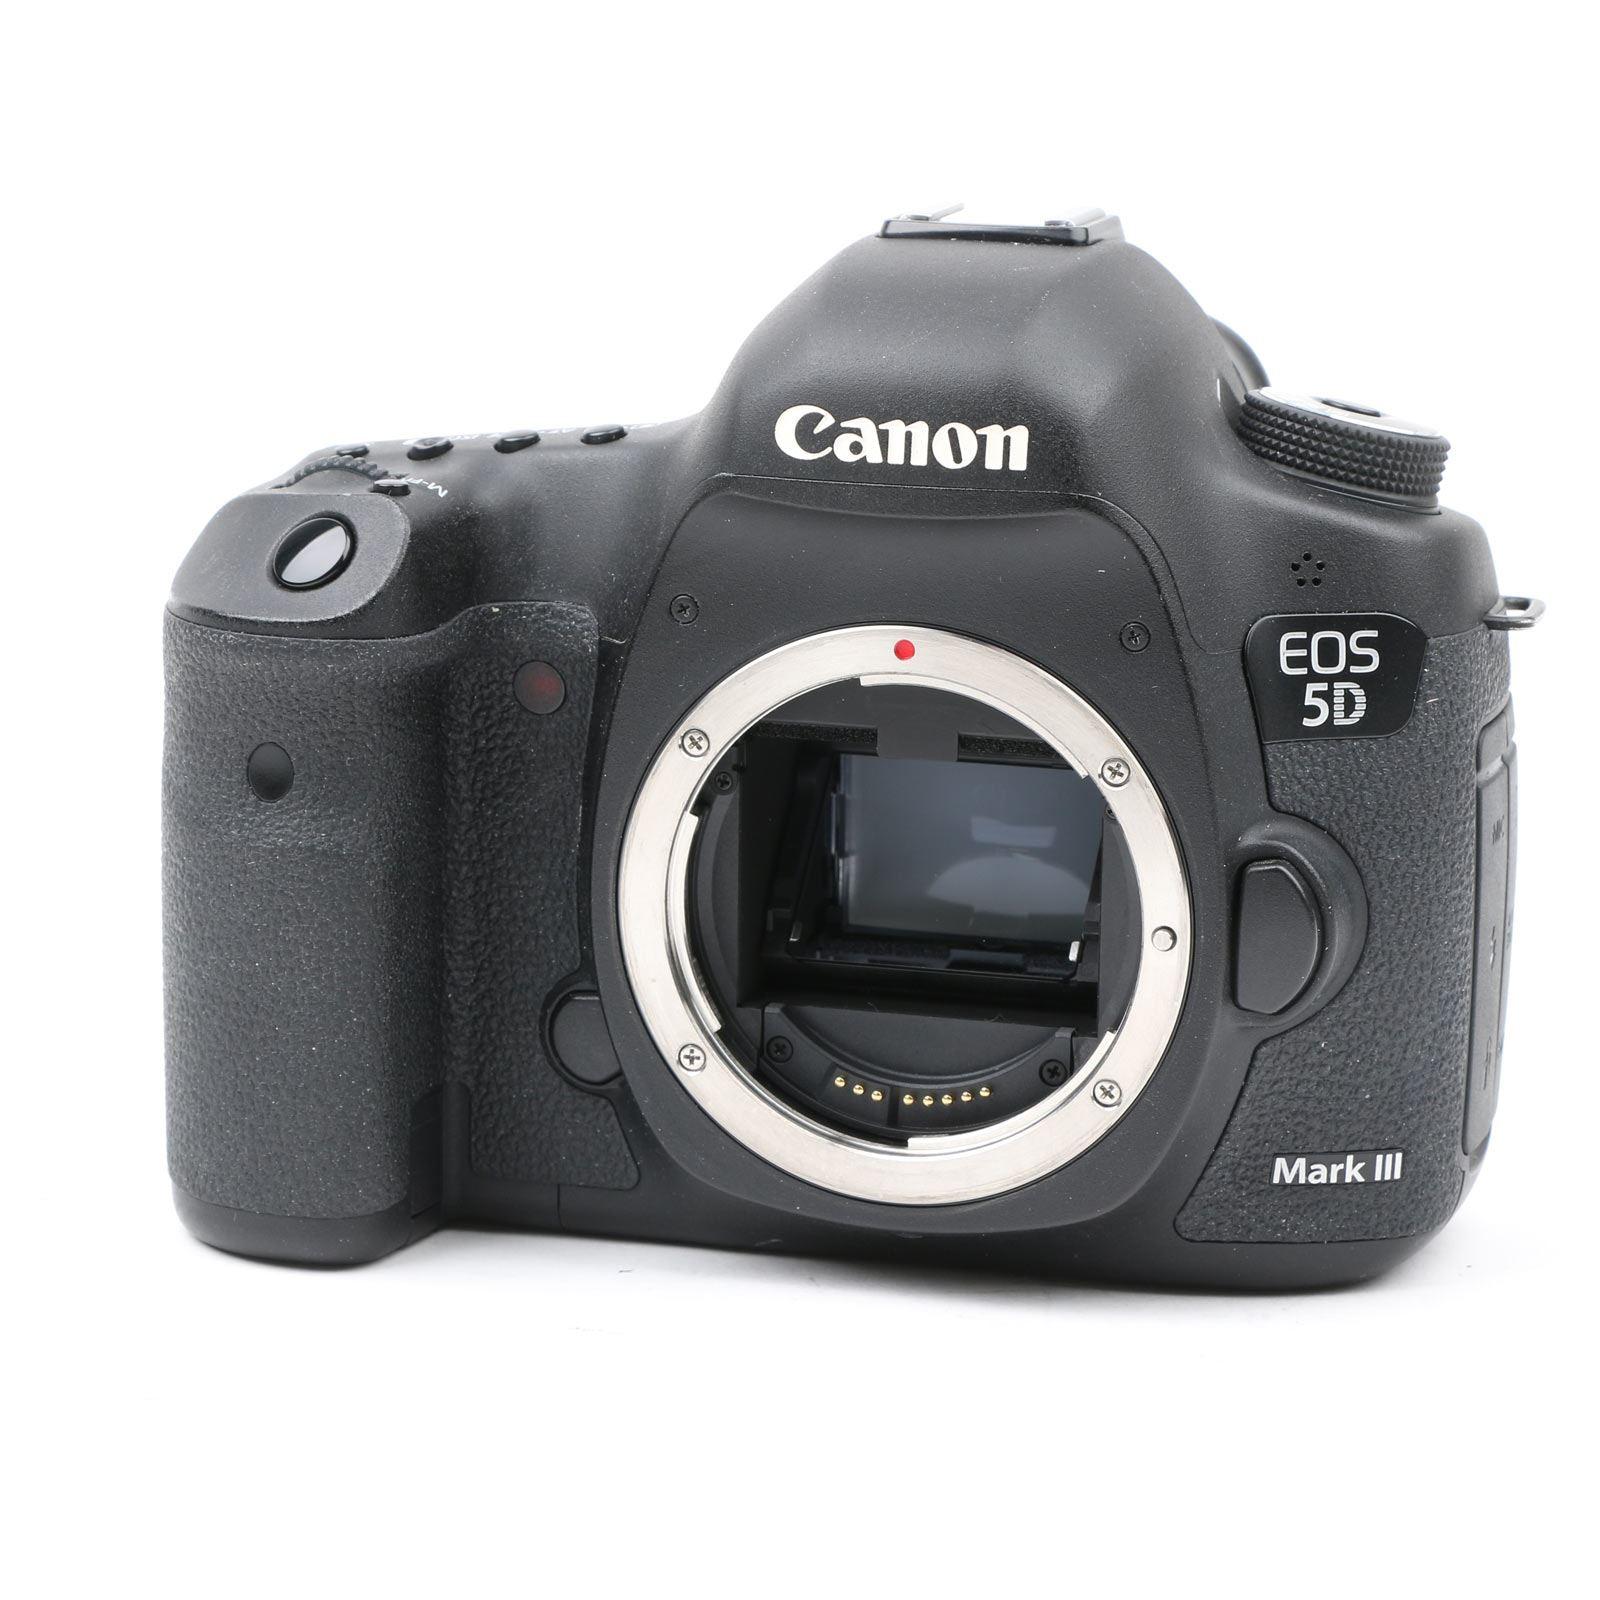 Image of Used Canon EOS 5D Mark III Digital SLR Camera Body